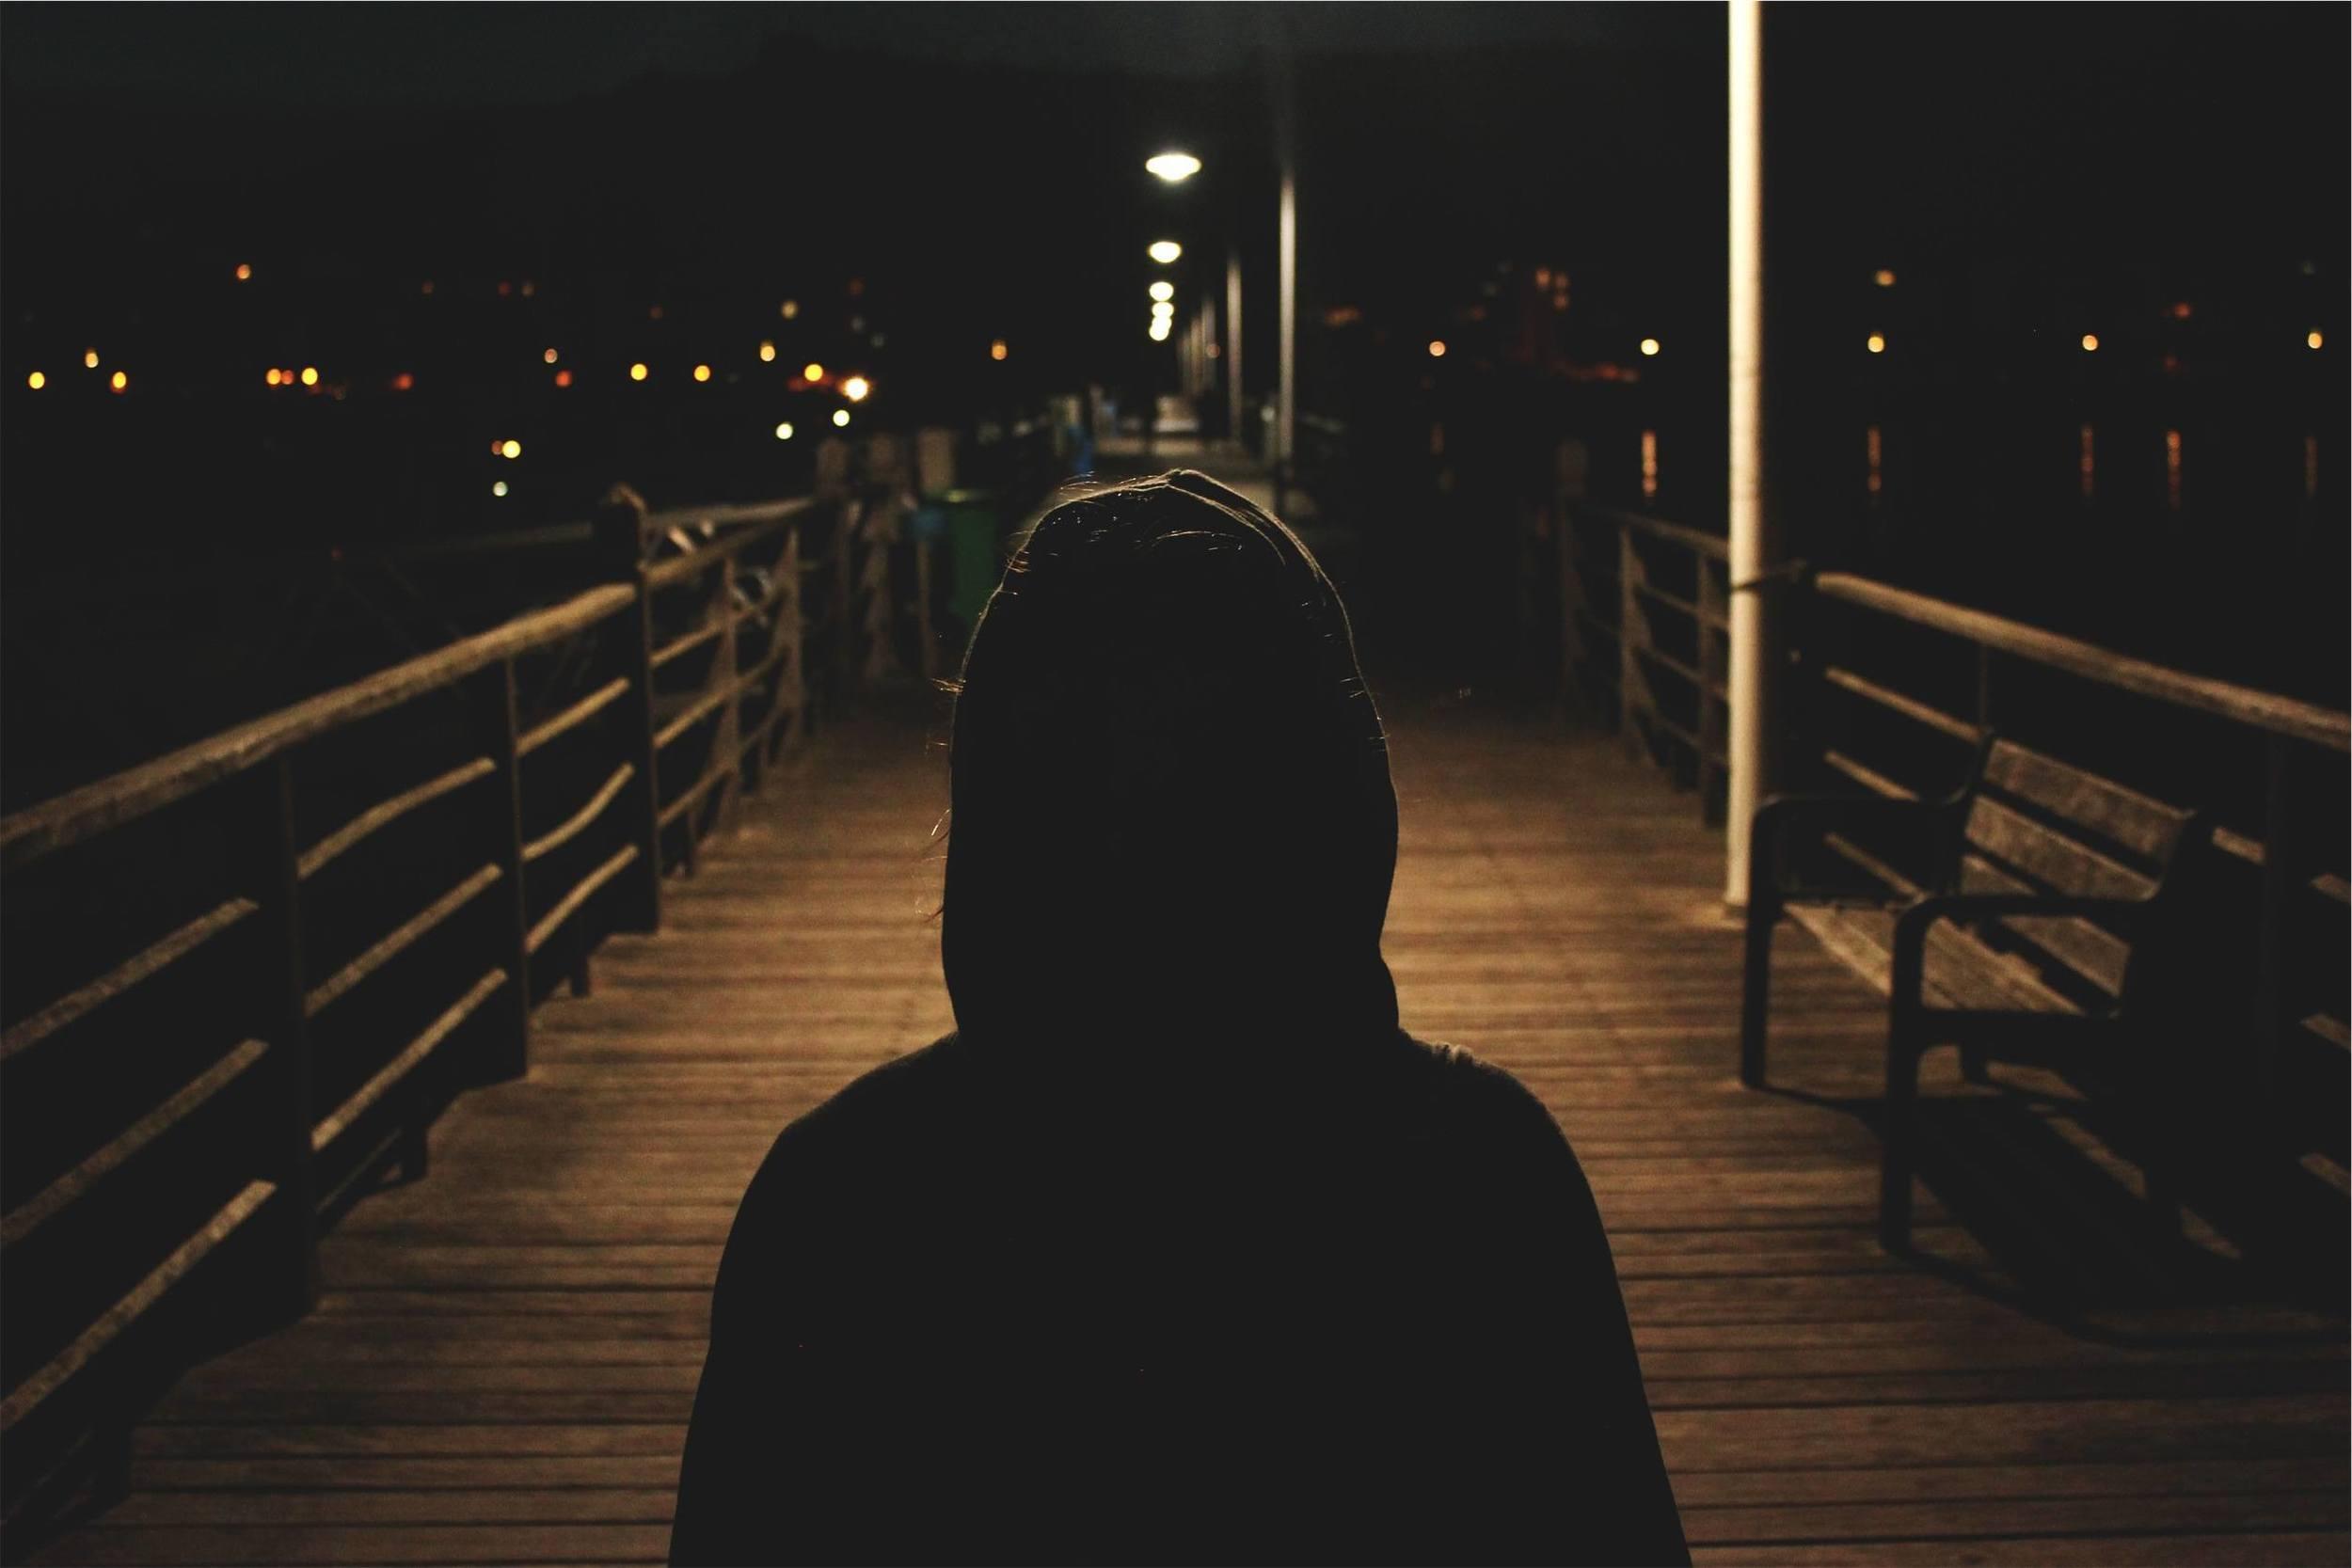 Man thinking about dark social